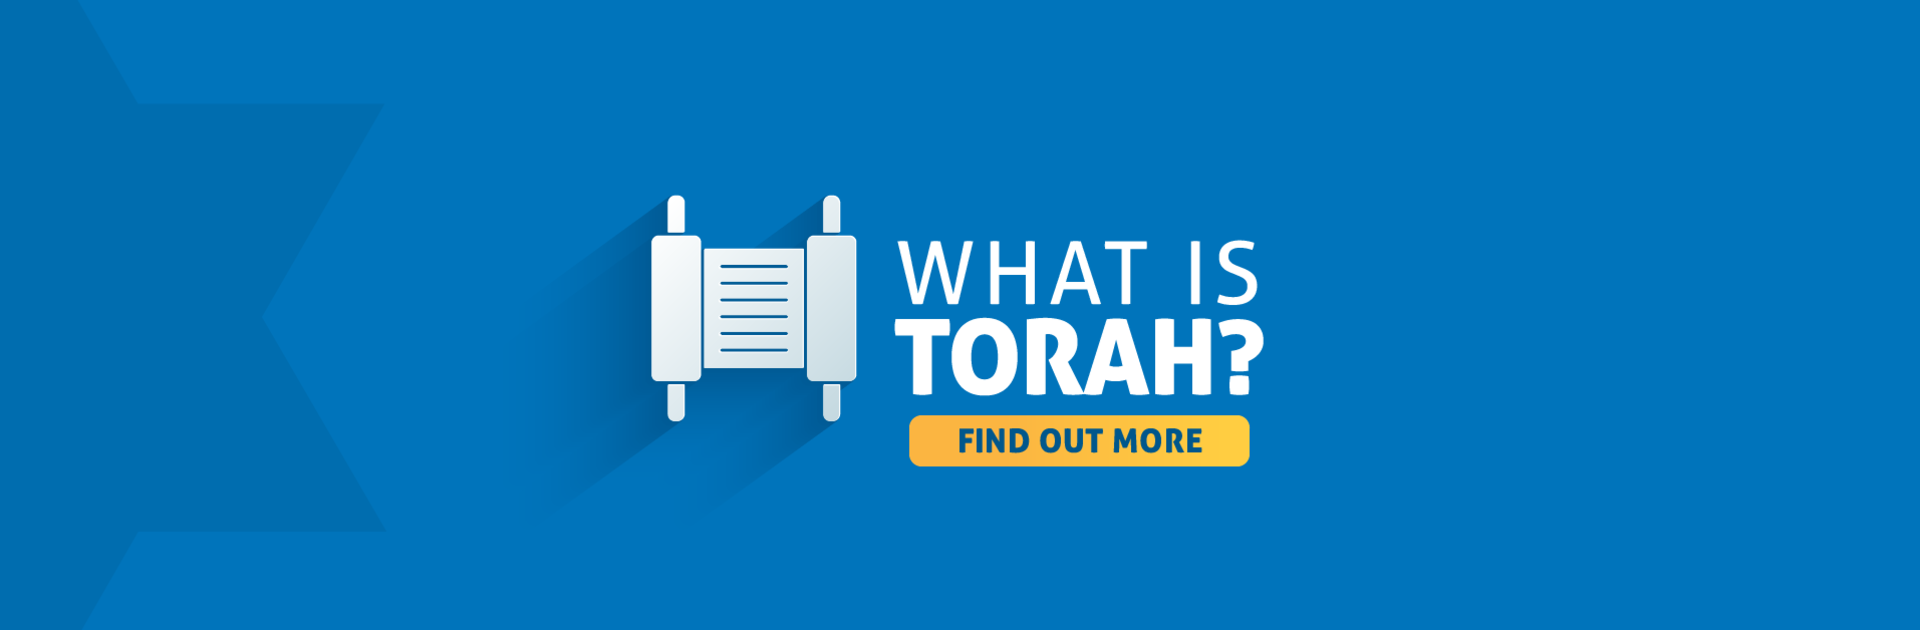 What Is Torah? image